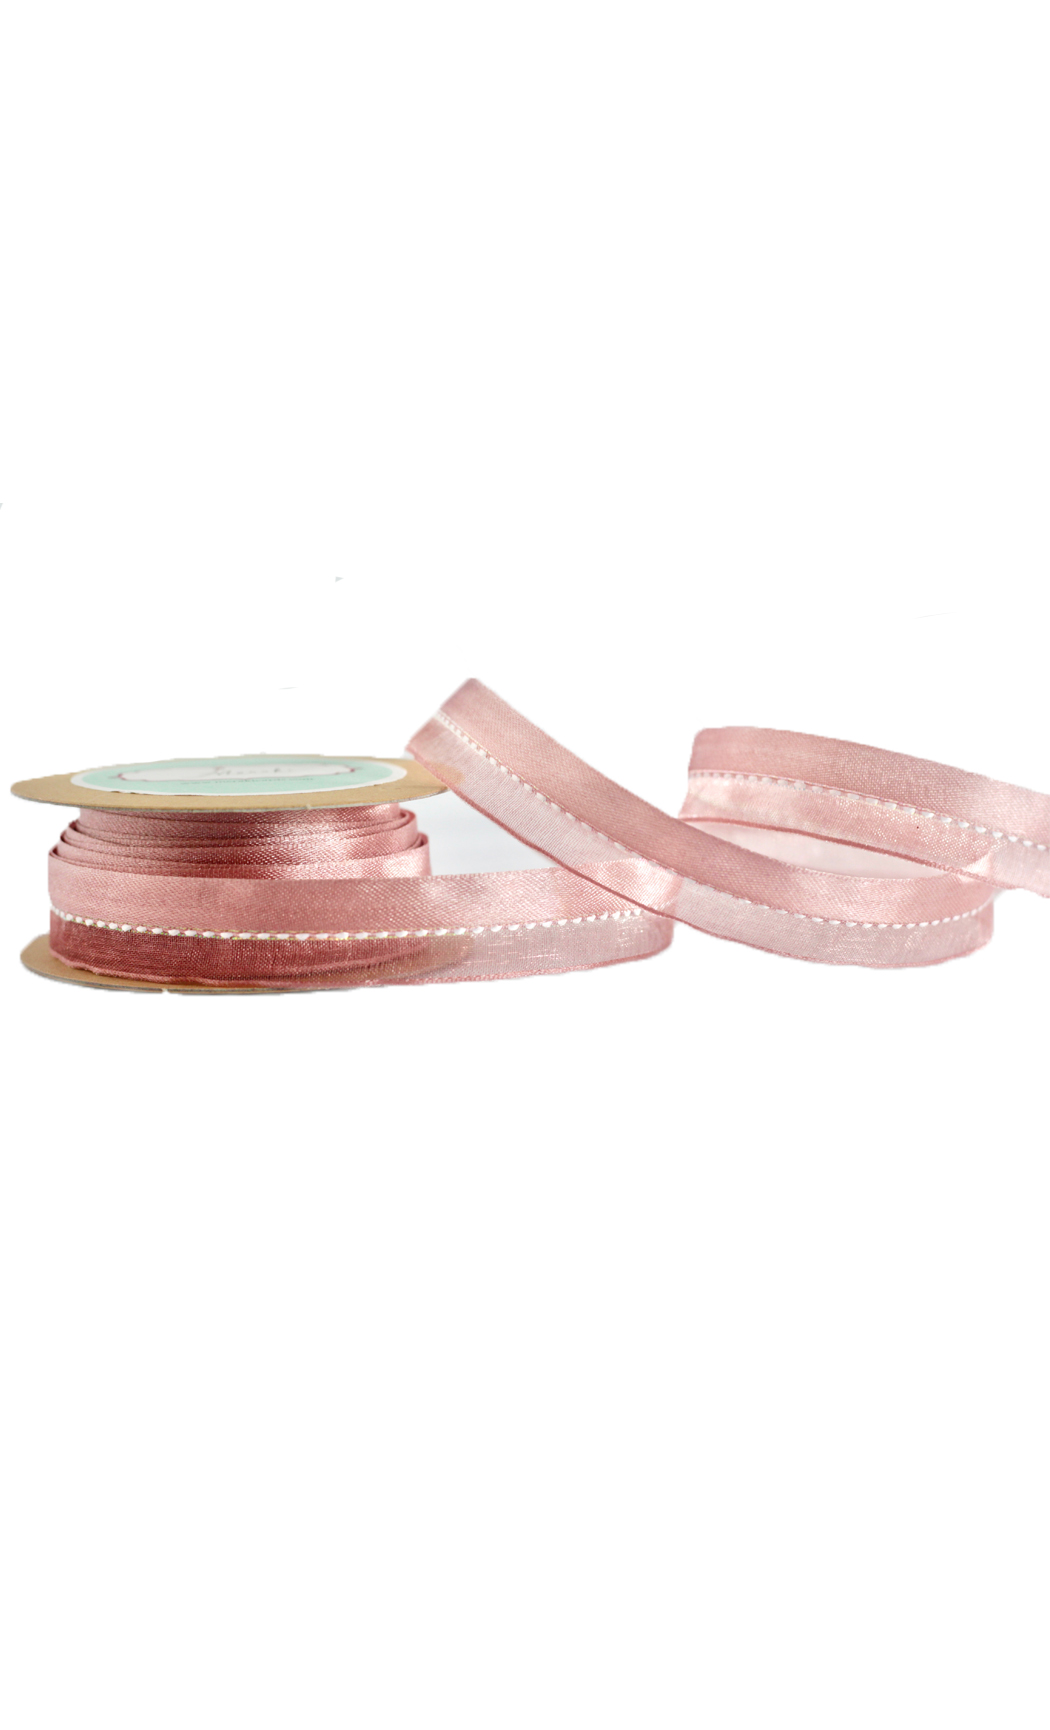 Dirty Rose Half and Half Ribbon - Buy Online